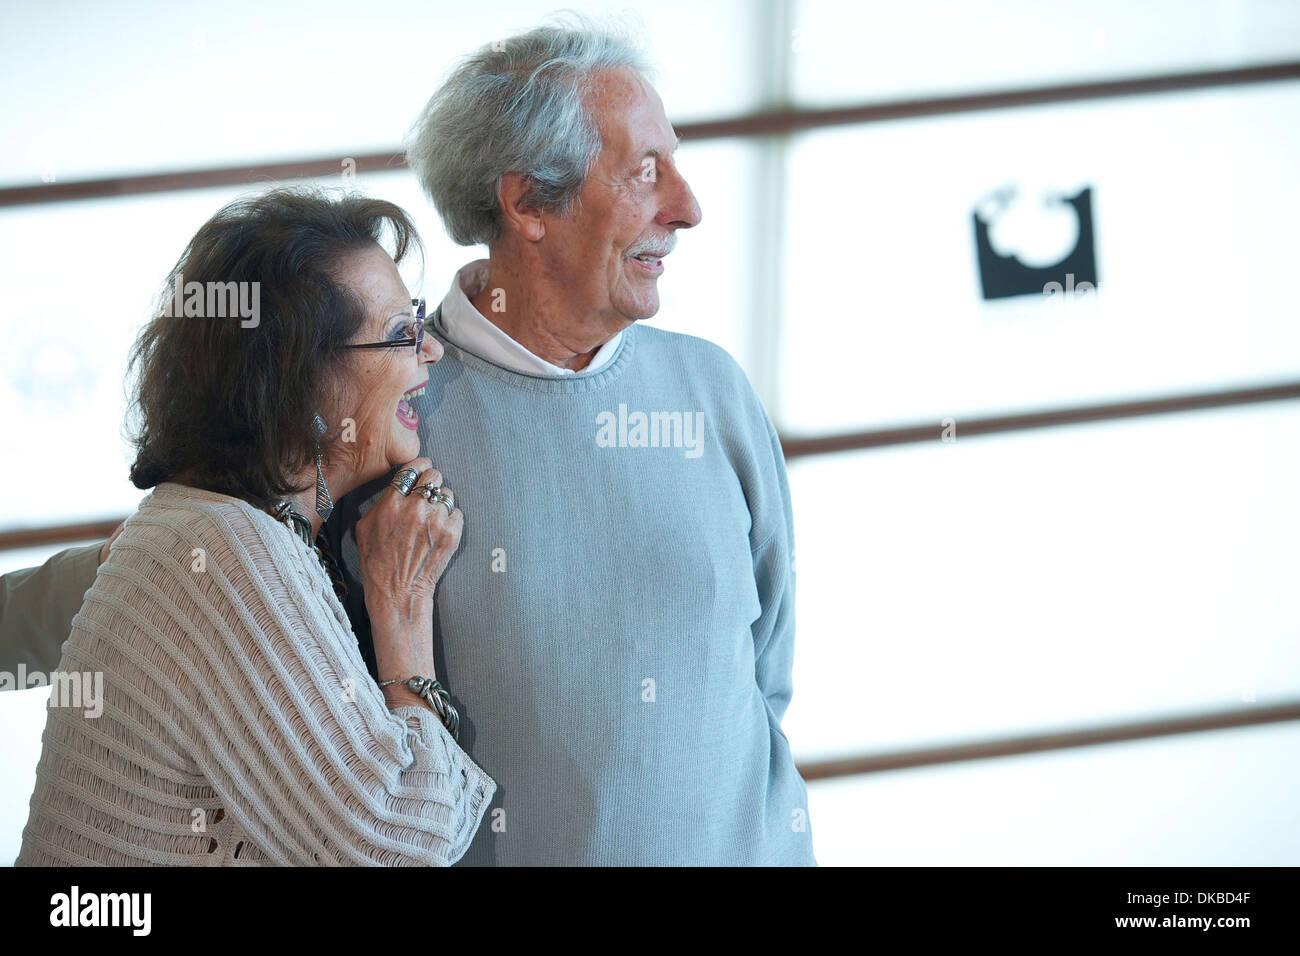 "Claudia Cardinale e Jean Rochefort "" El artista y la modelo' photocall al Kursaal Palace durante il sessantesimo San Sebastian Immagini Stock"